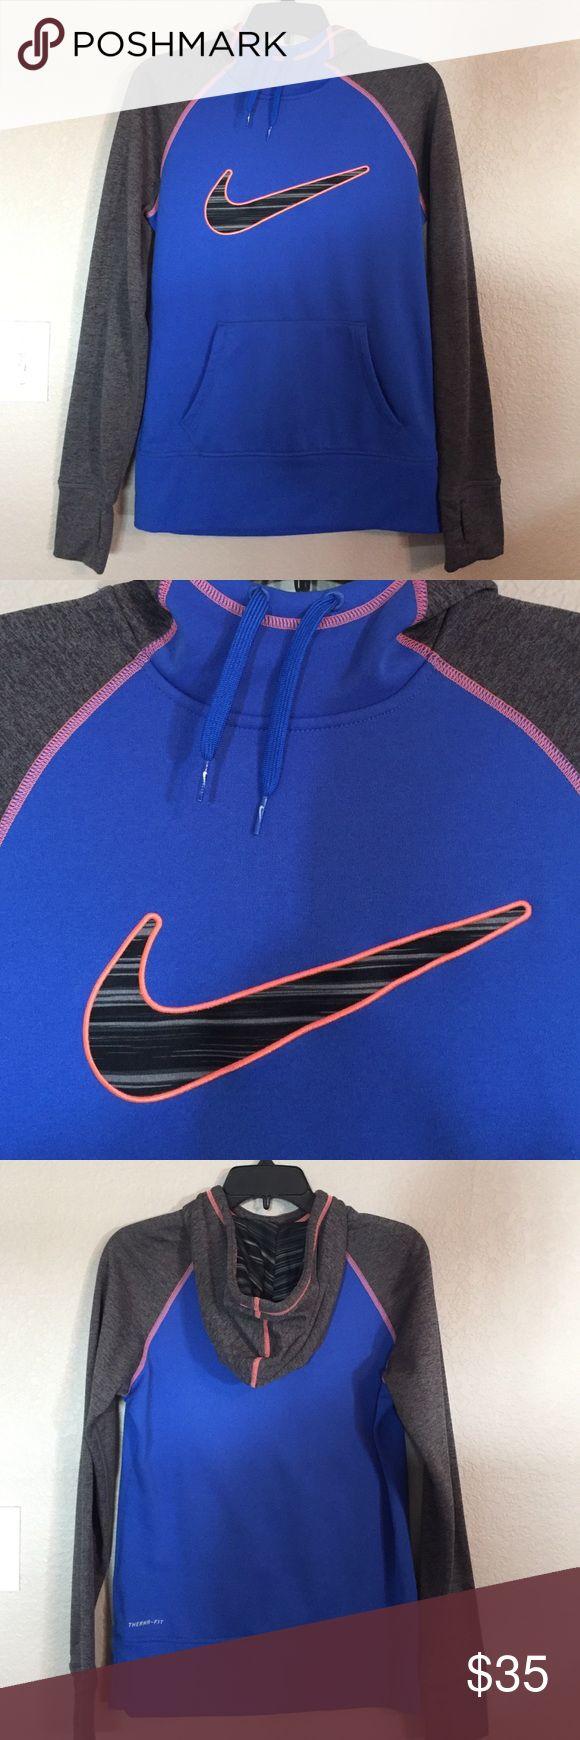 Nike Blue, Black, Gray, and Orange Hoodie Nike Blue, Black, Gray, and Orange Hoodie. Worn once or twice. I'm a Broncos fan, so this was perfect! Nike Tops Sweatshirts & Hoodies